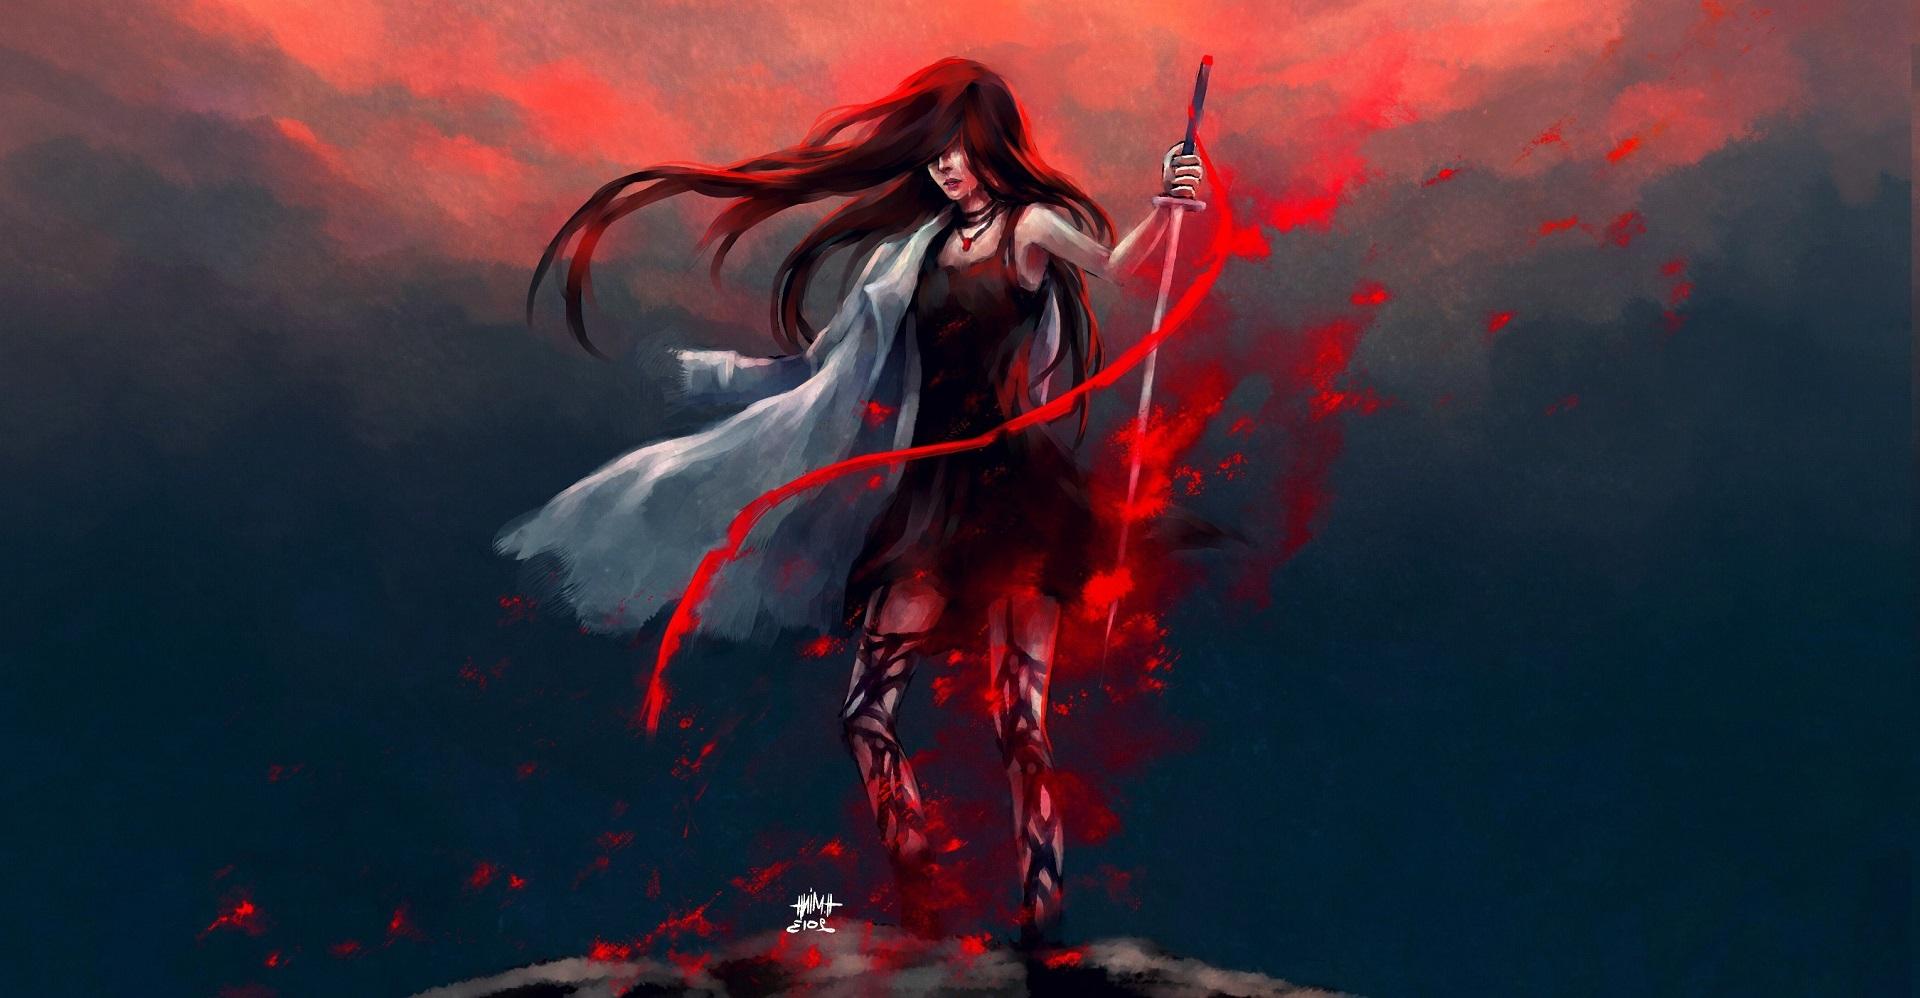 General 1920x998 artwork fantasy art fantasy girl sword long hair women